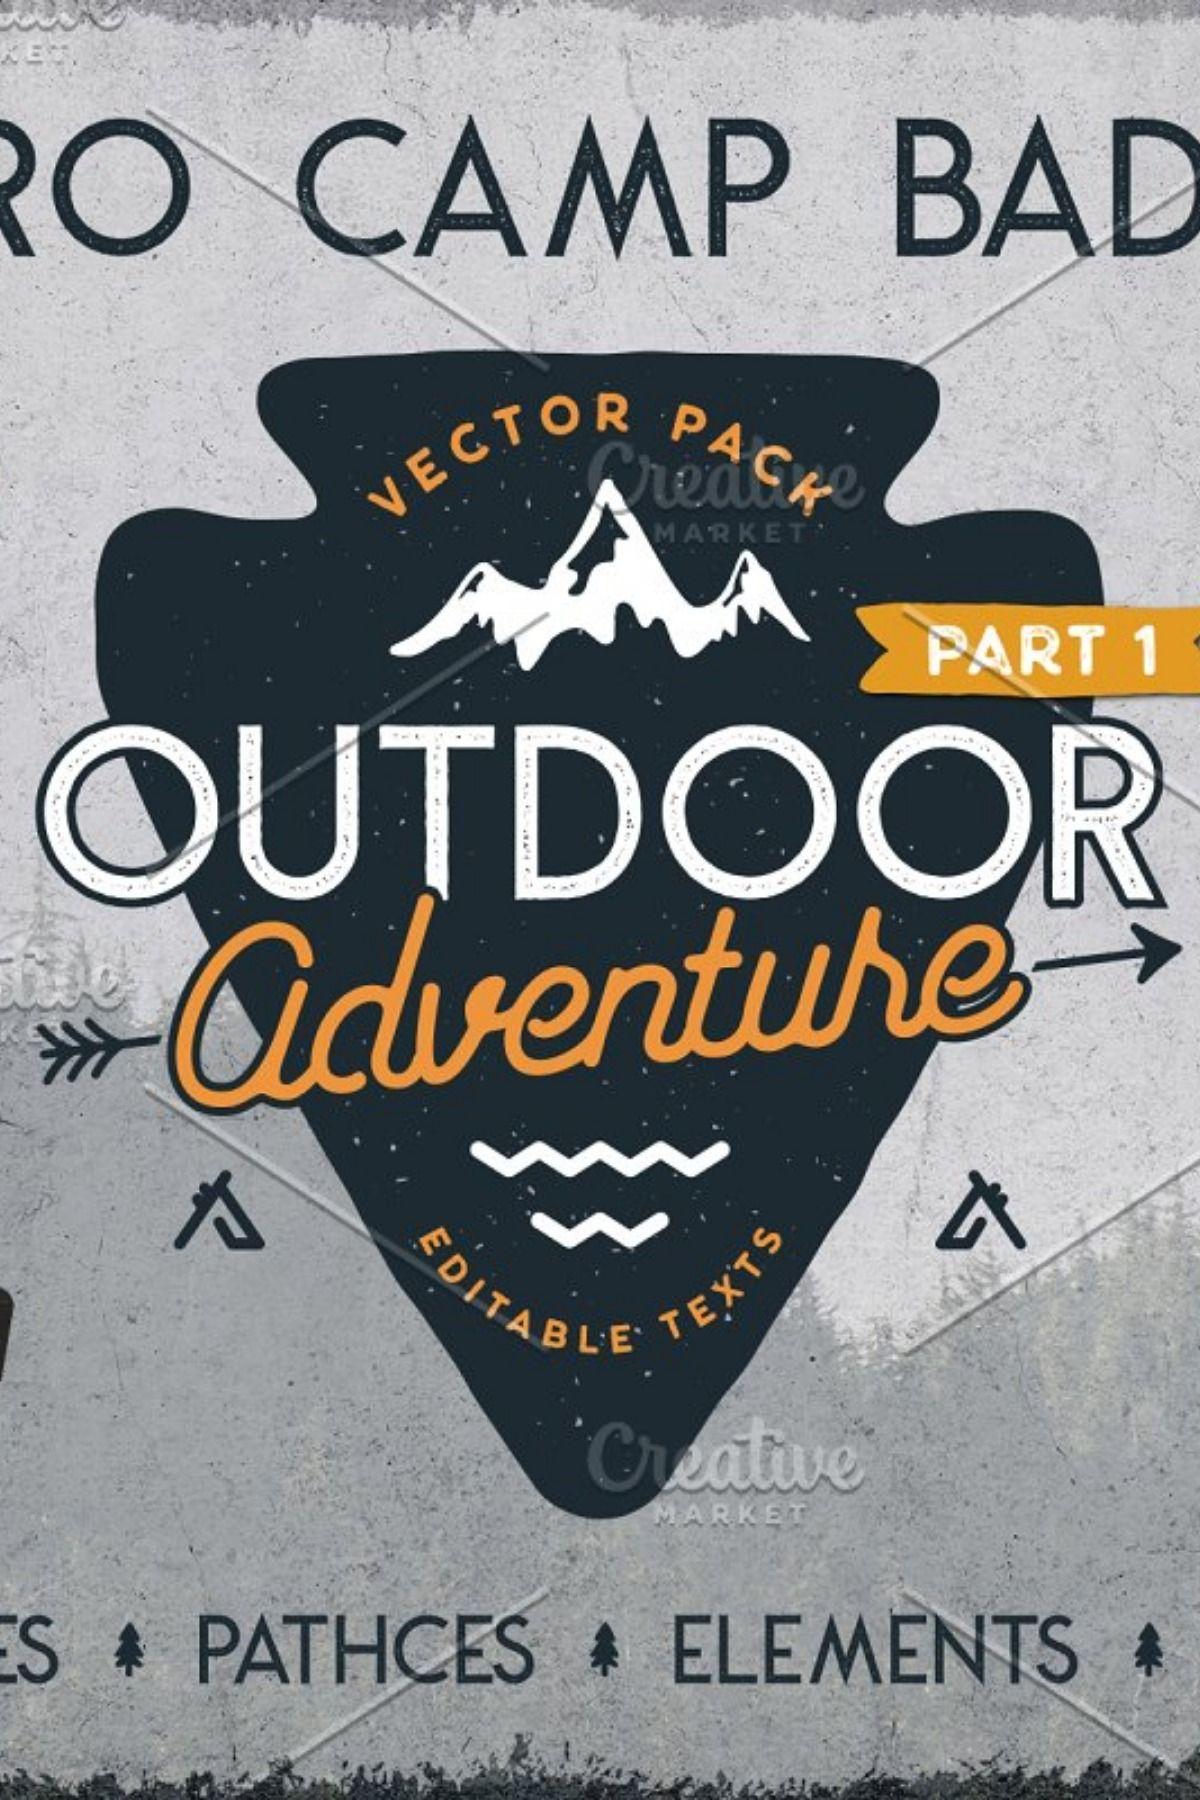 Retro Camp Badges / Outdoor Patches Adventure logo